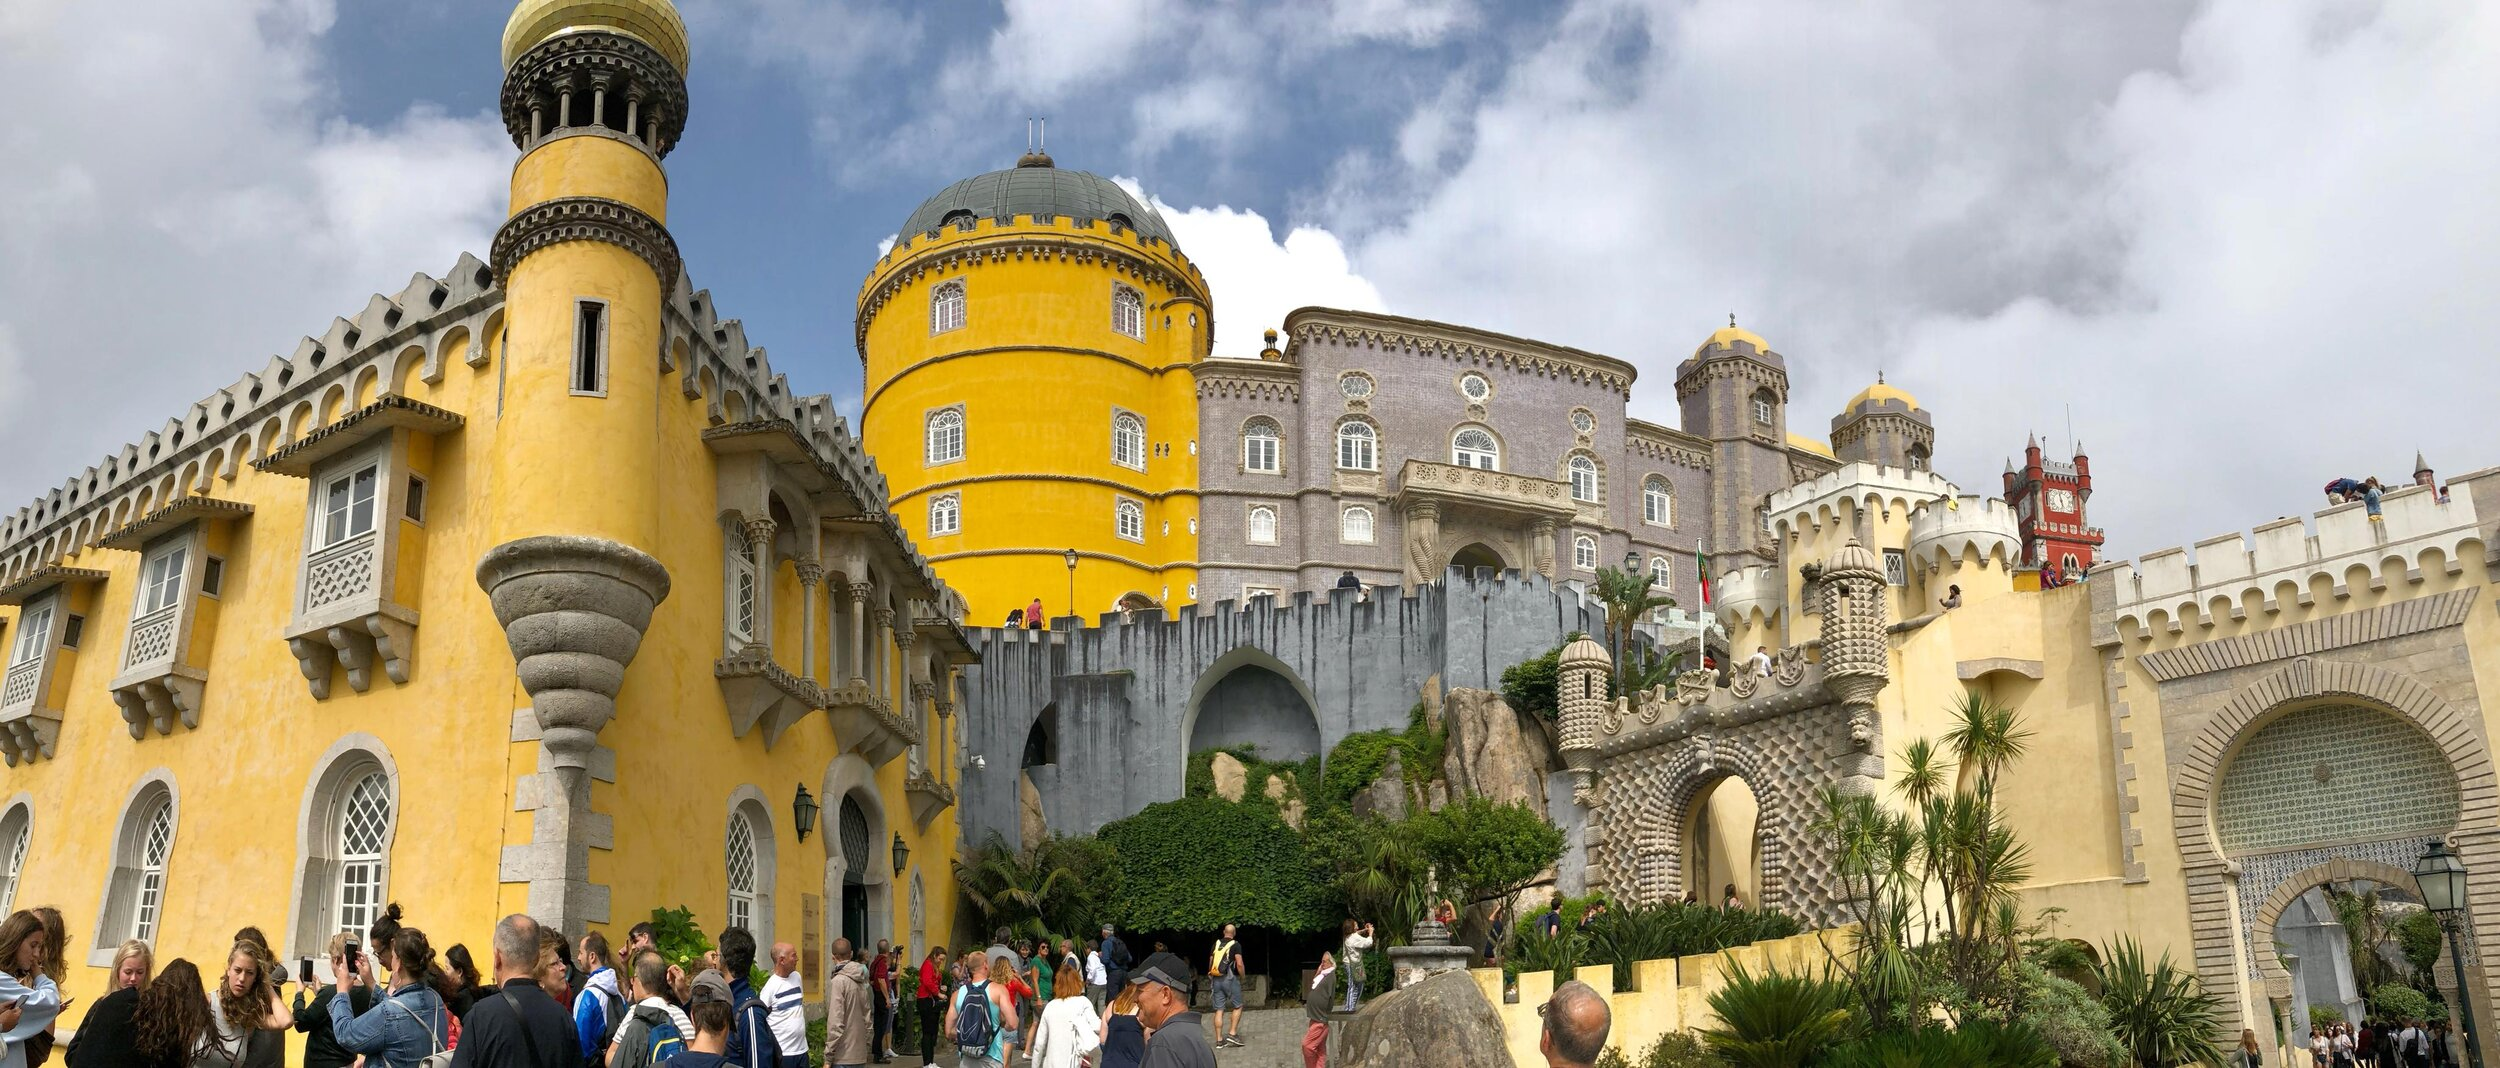 Palácio da Pena - Pena Palace